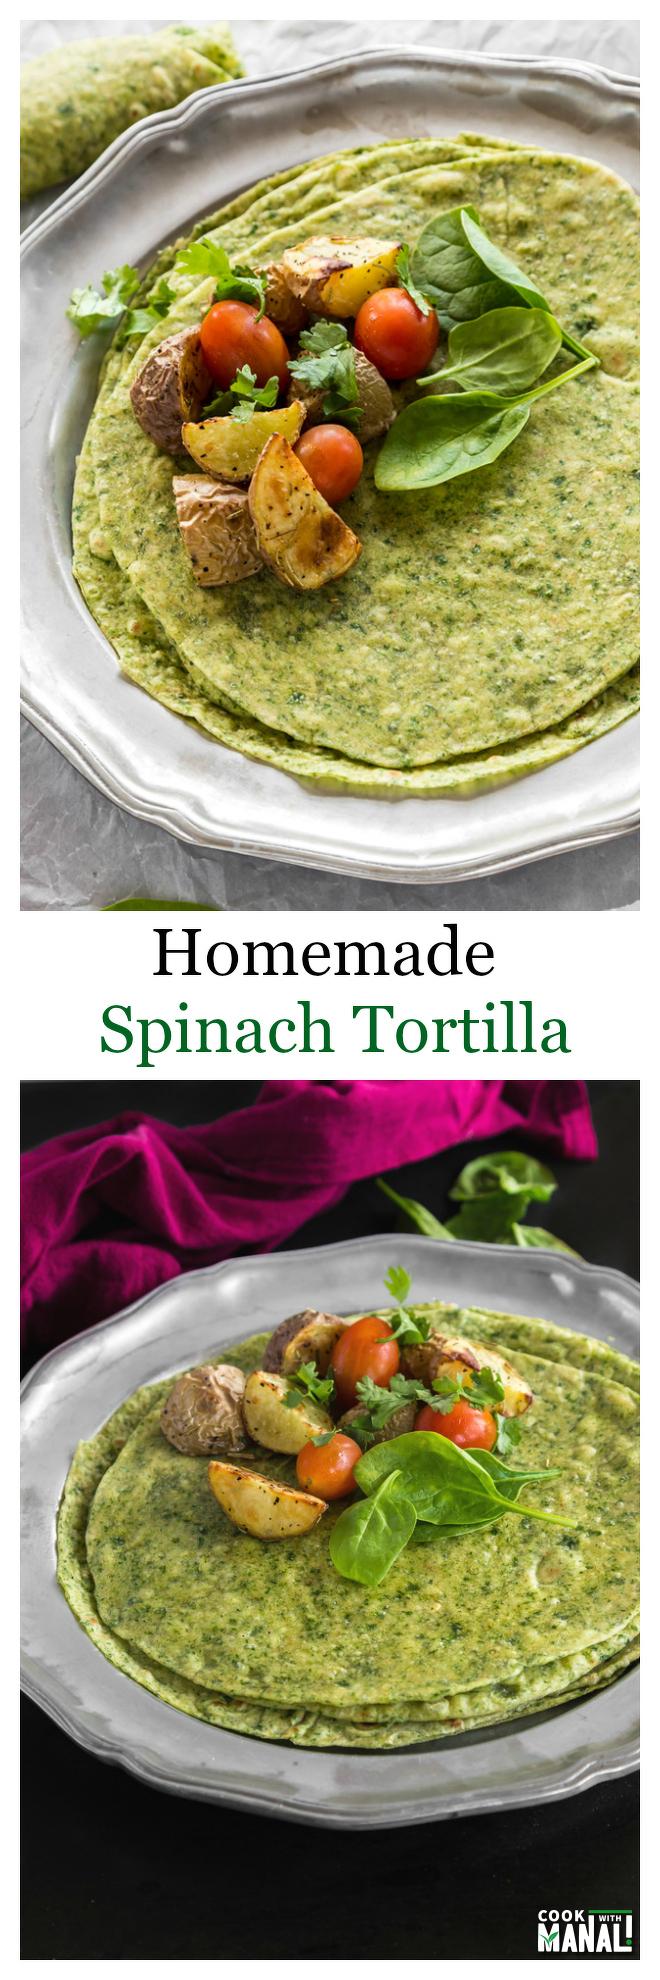 Spinach Tortilla-Collage